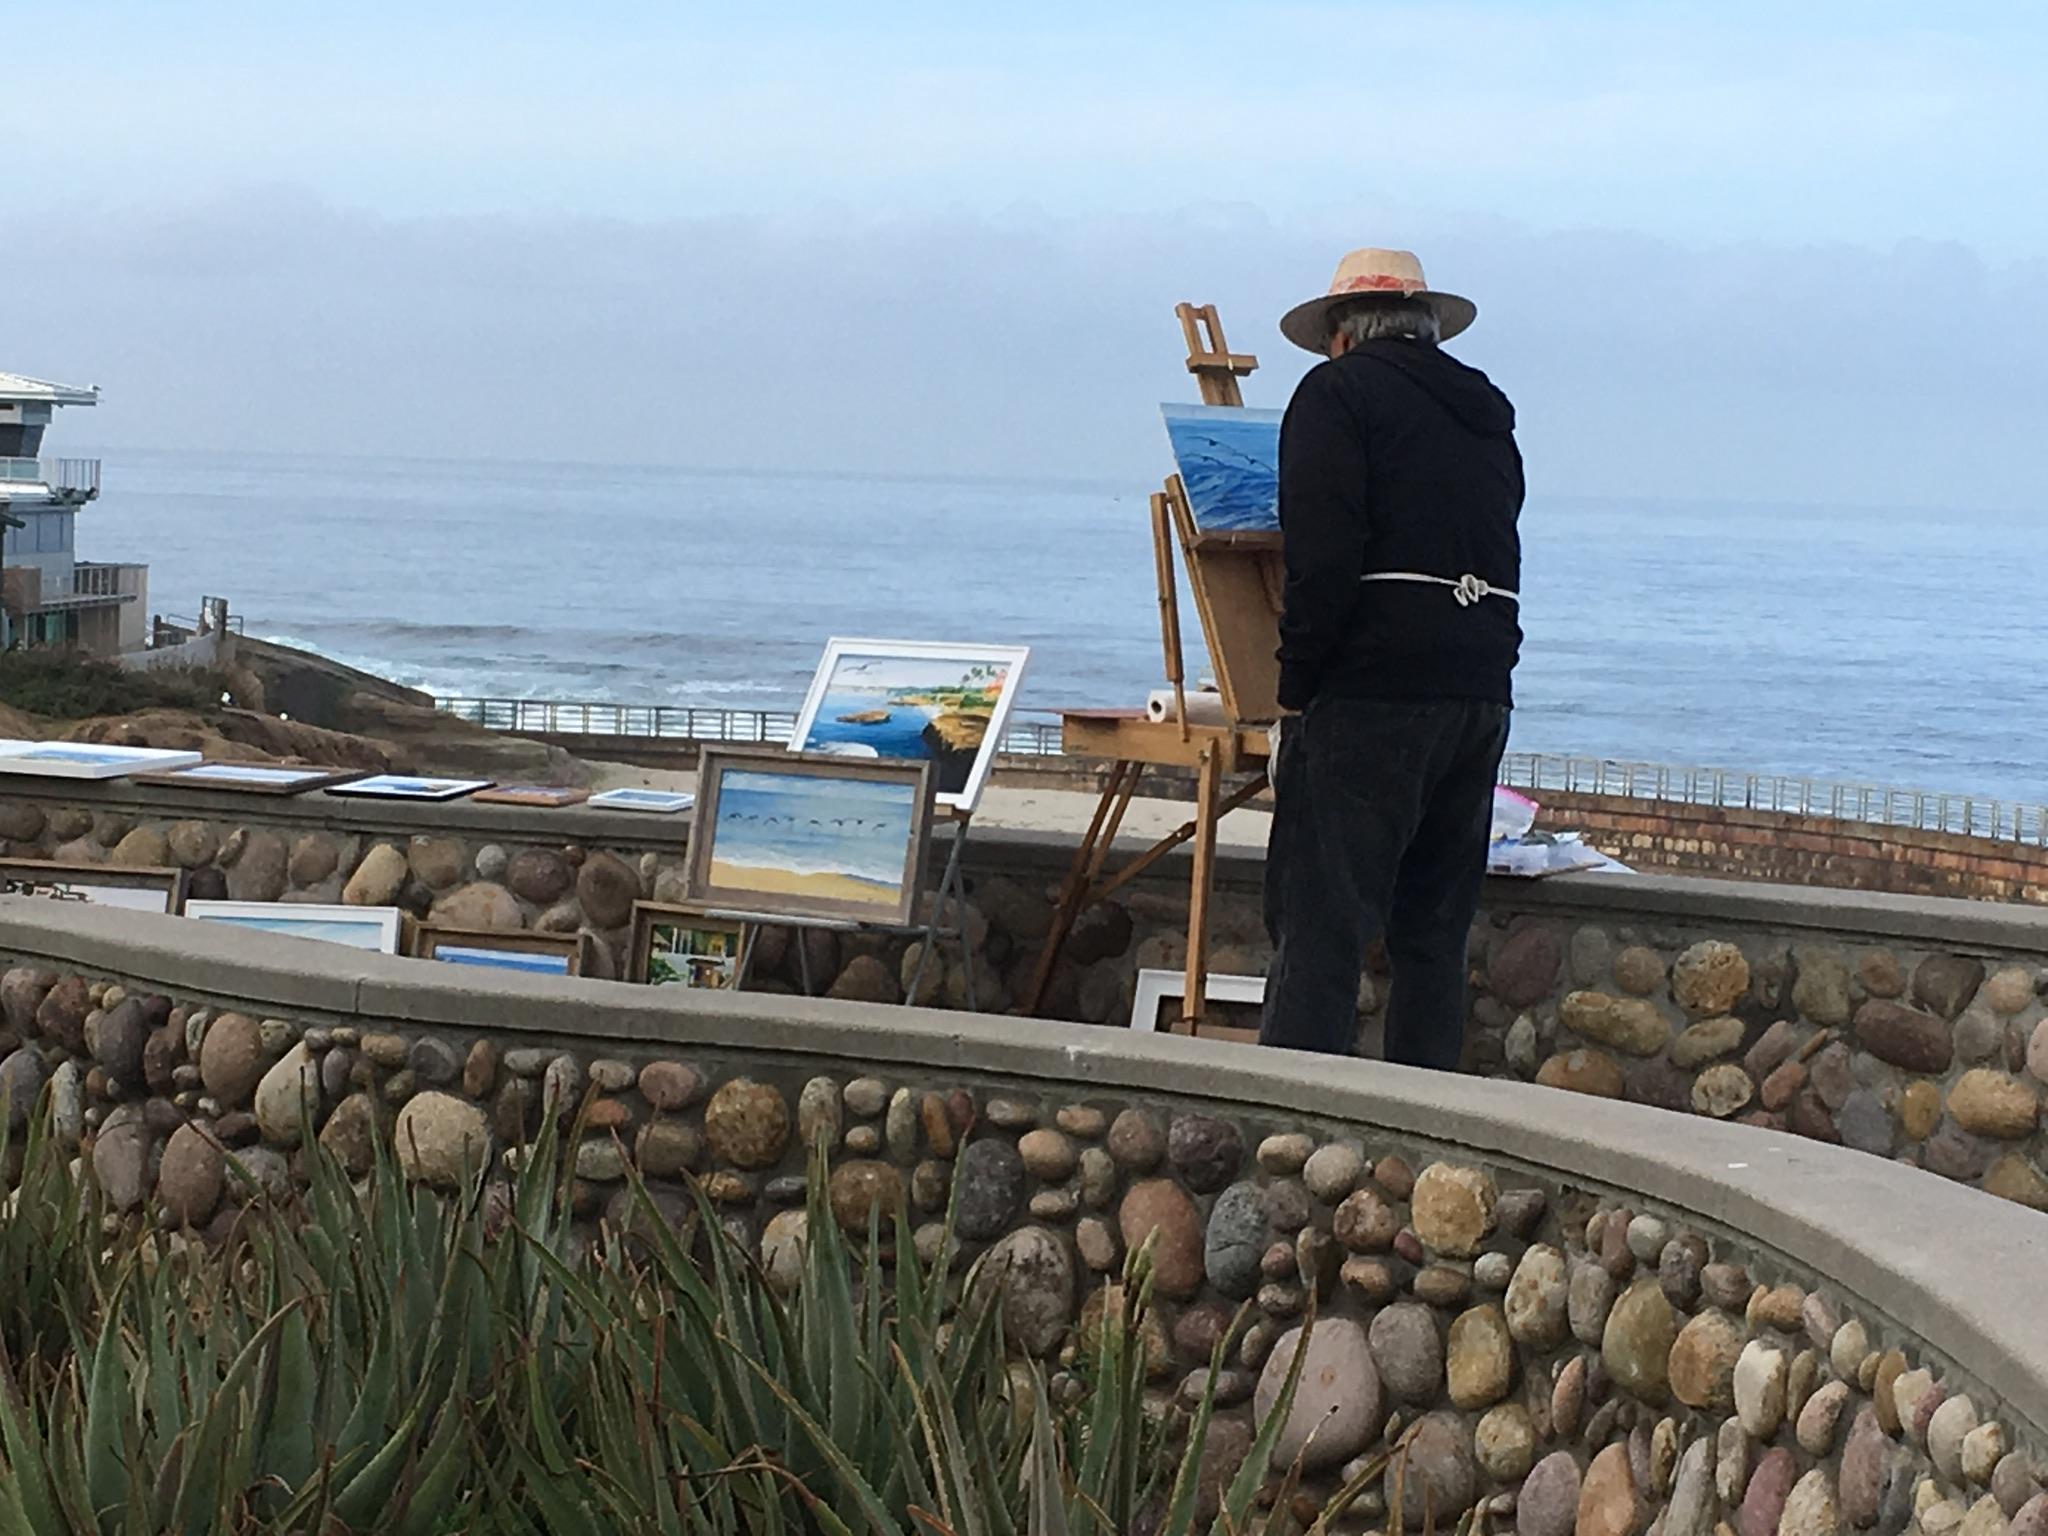 An artist paints en plain air along the coast in La Jolla.